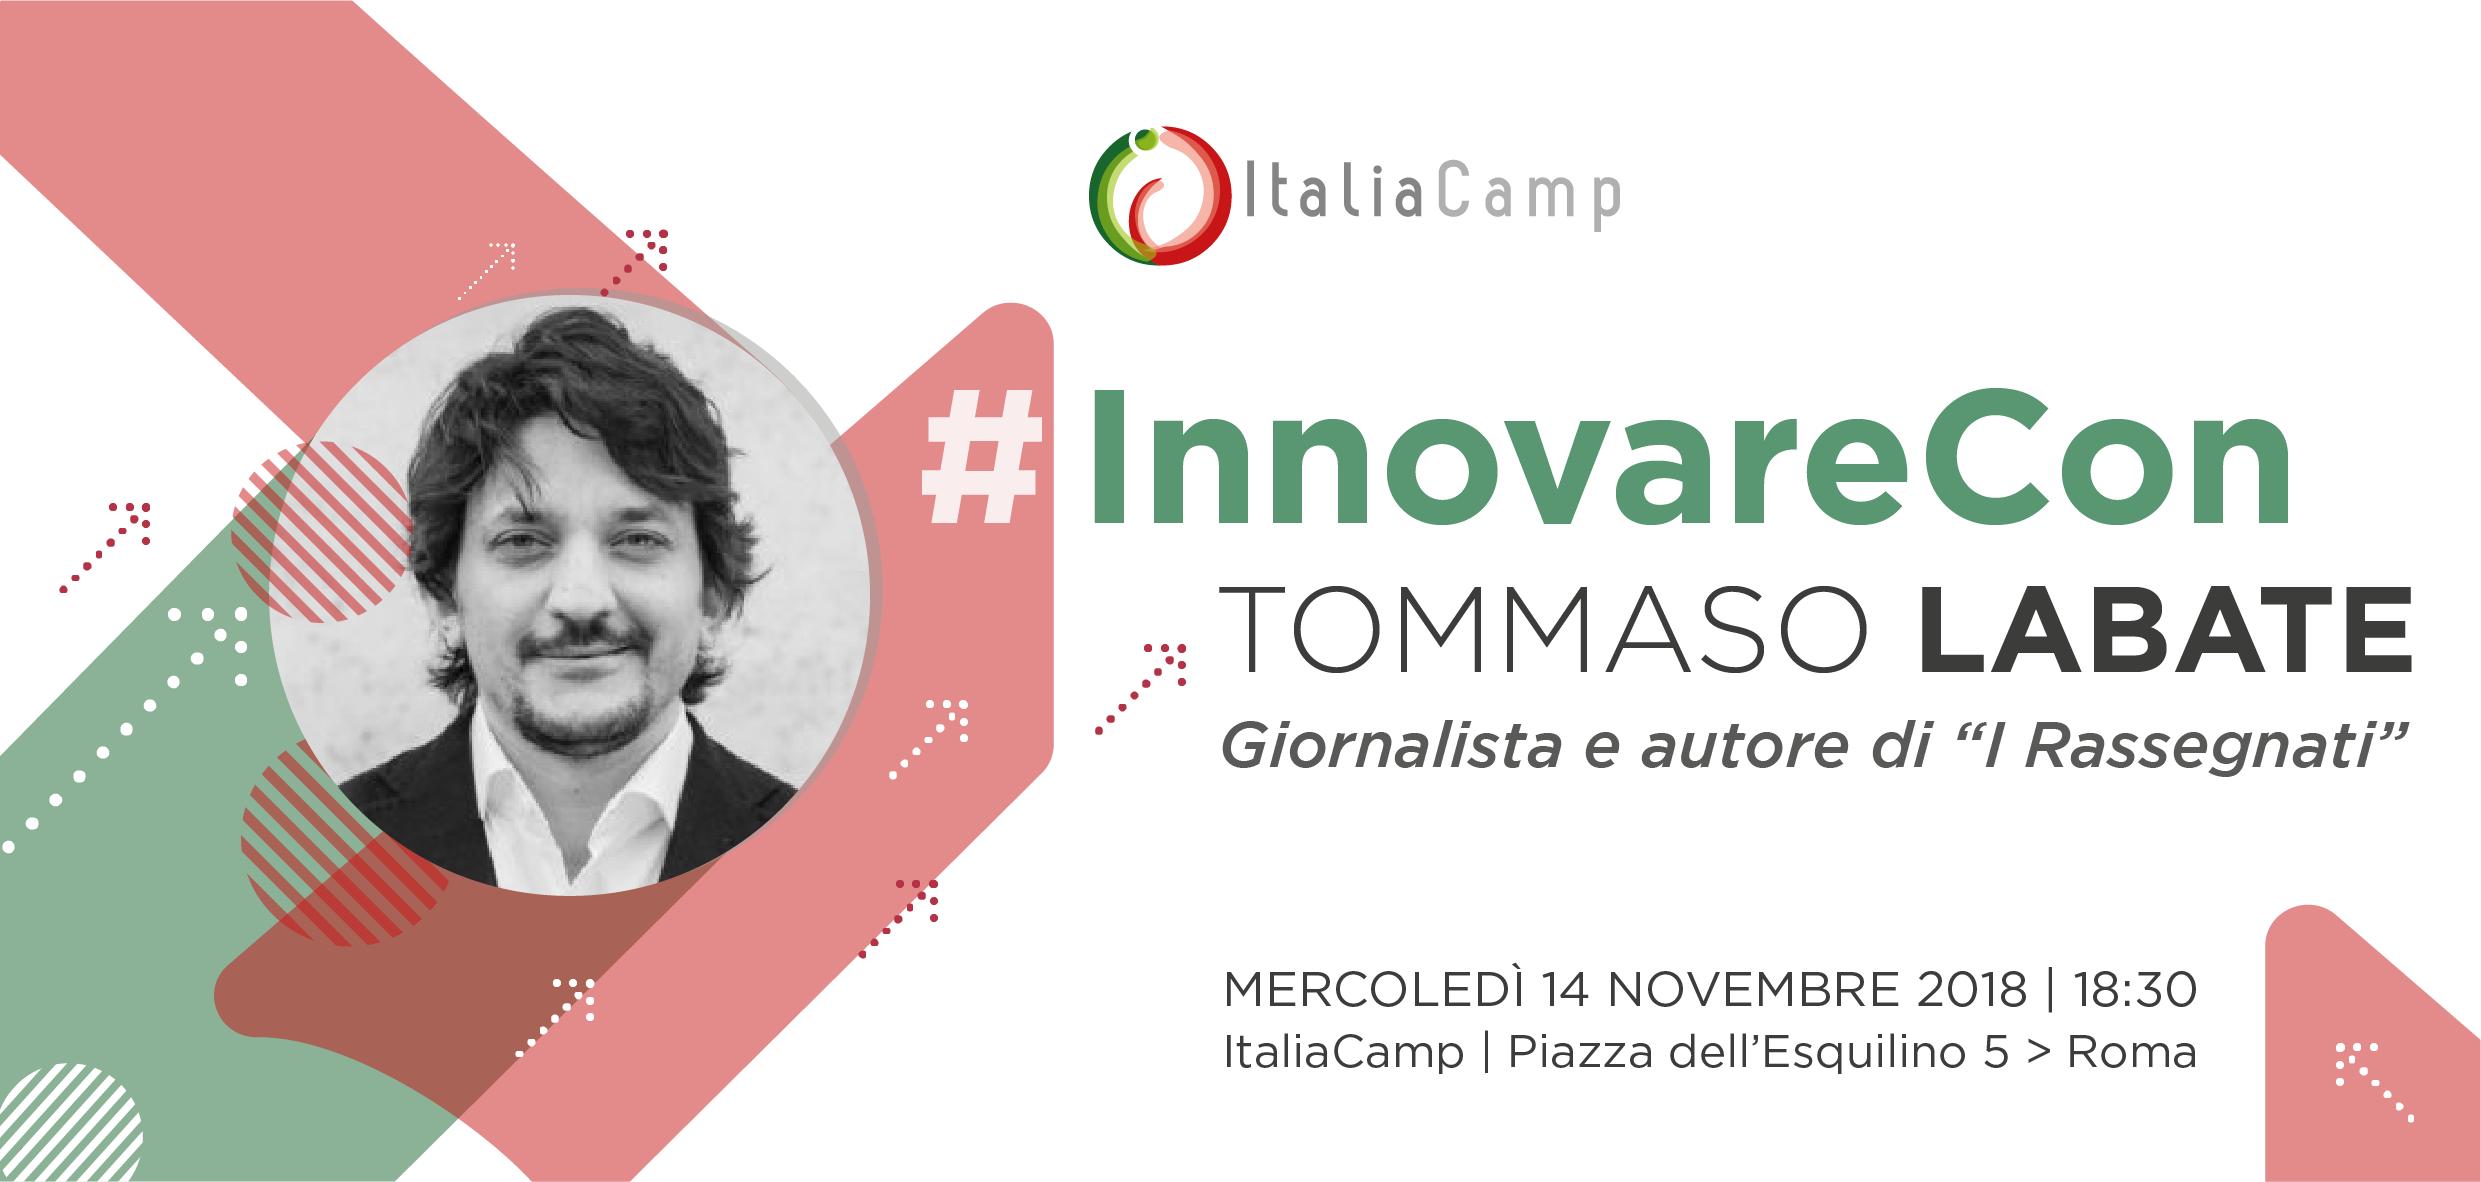 #InnovareCon Tommaso Labate